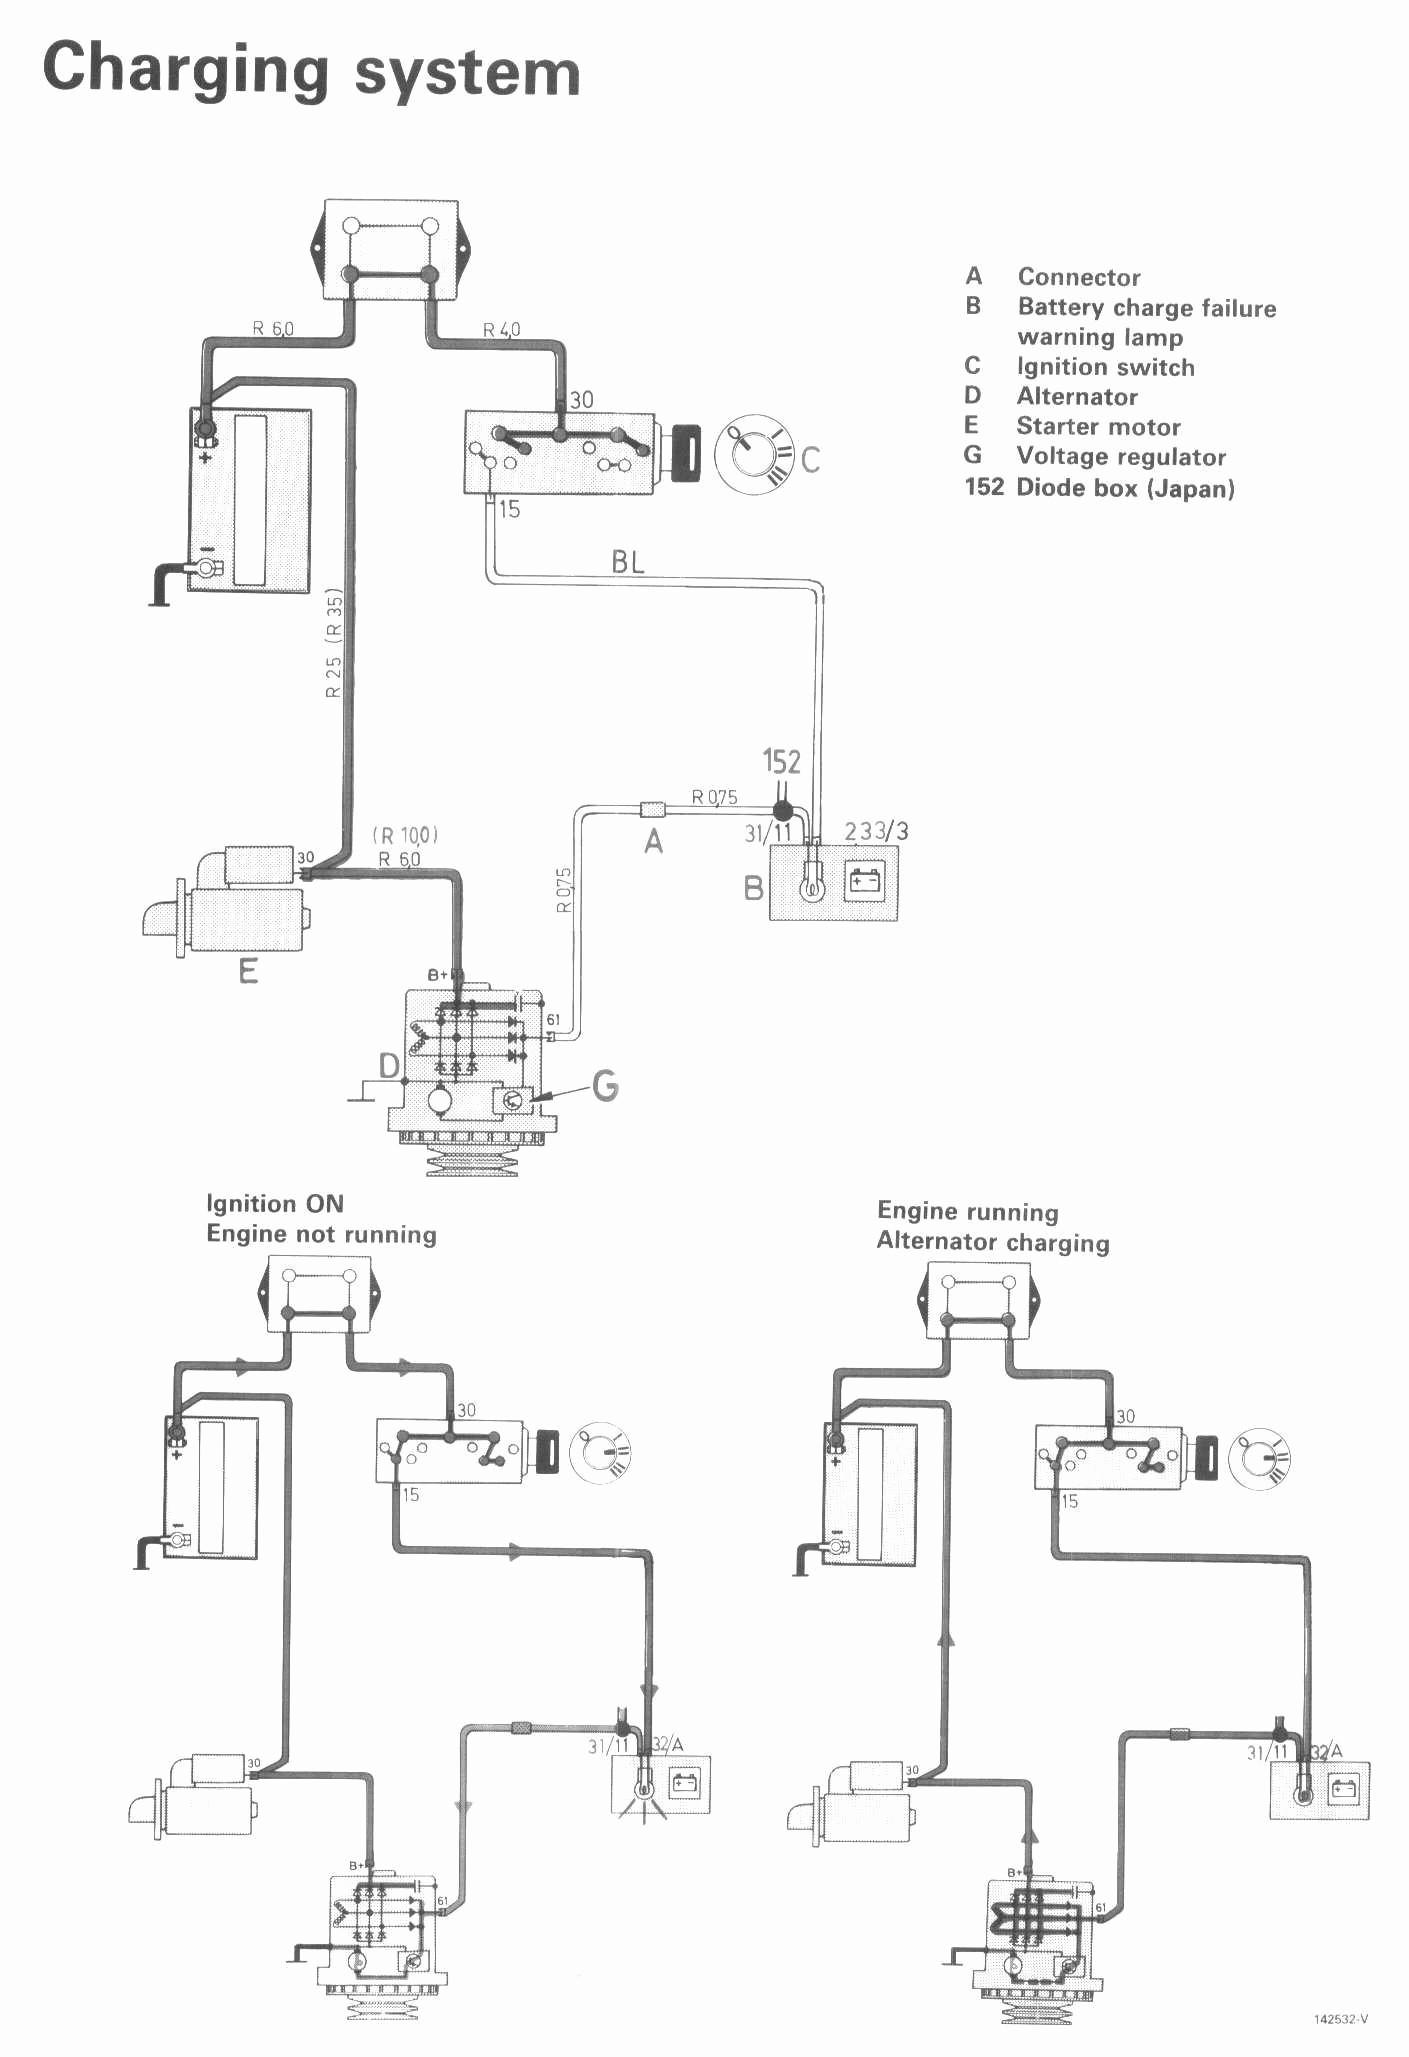 Volvo Motorola Alternator External Regulator Wiring Diagram - Wiring on